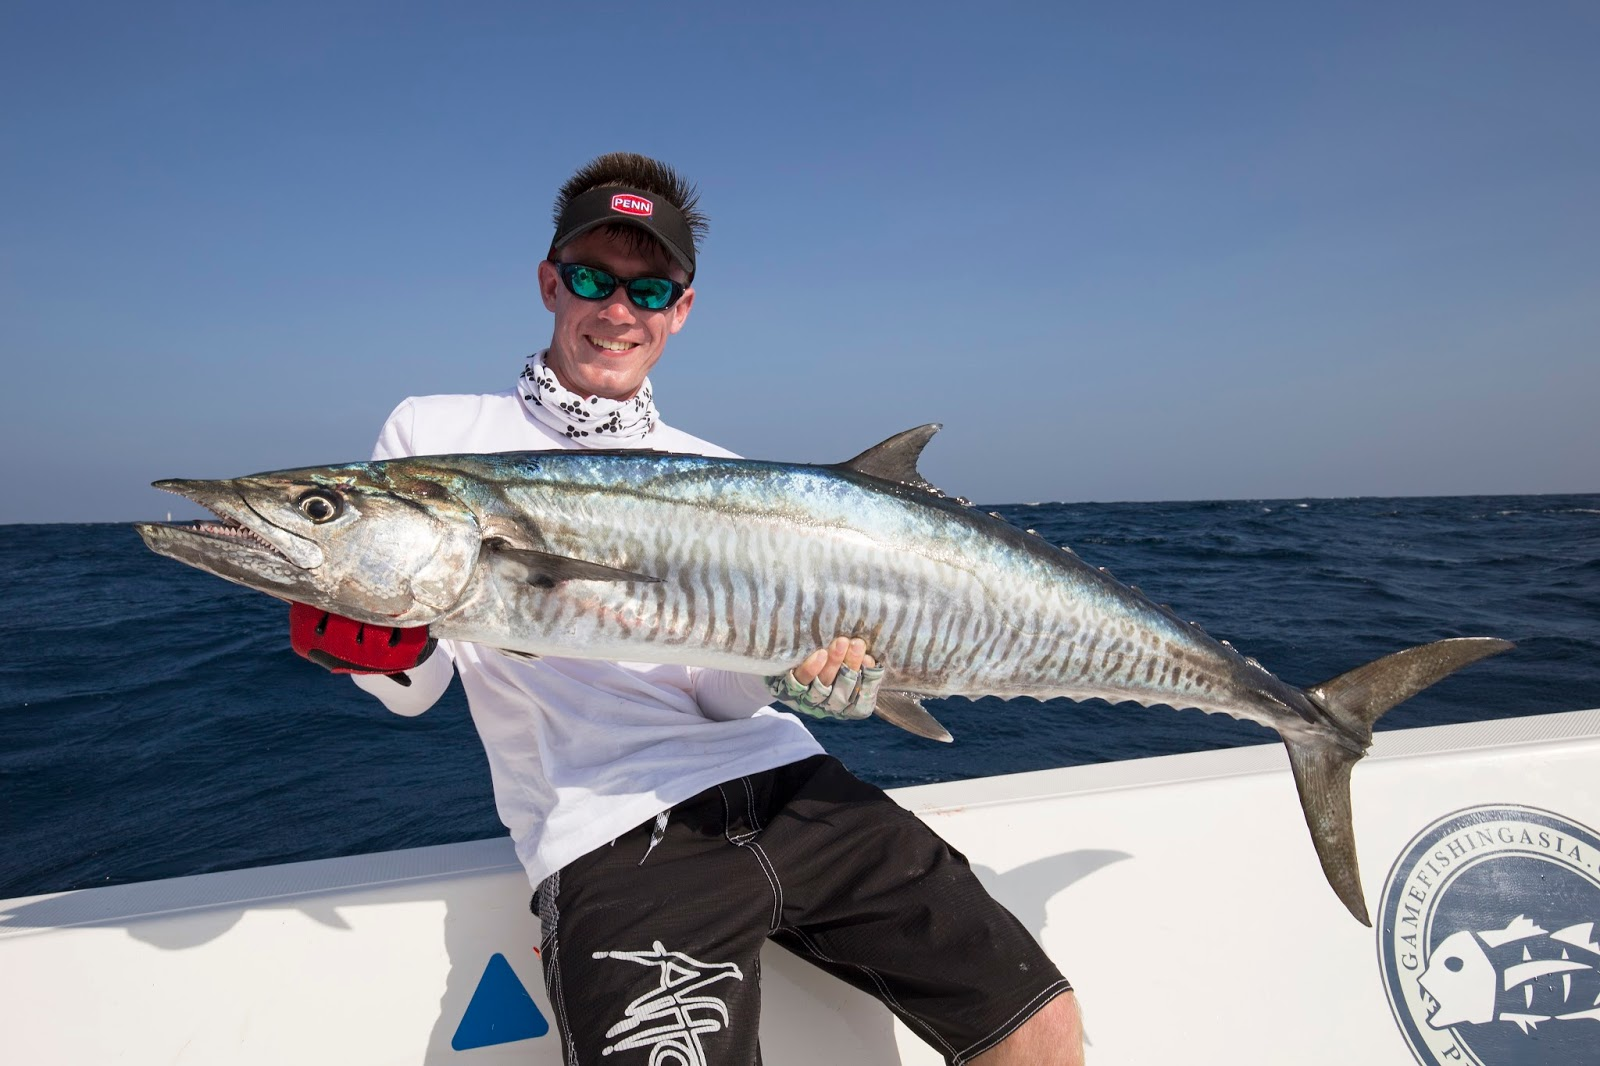 Sam edmonds fishing blog sri lanka part one saltwater for Fish in spanish